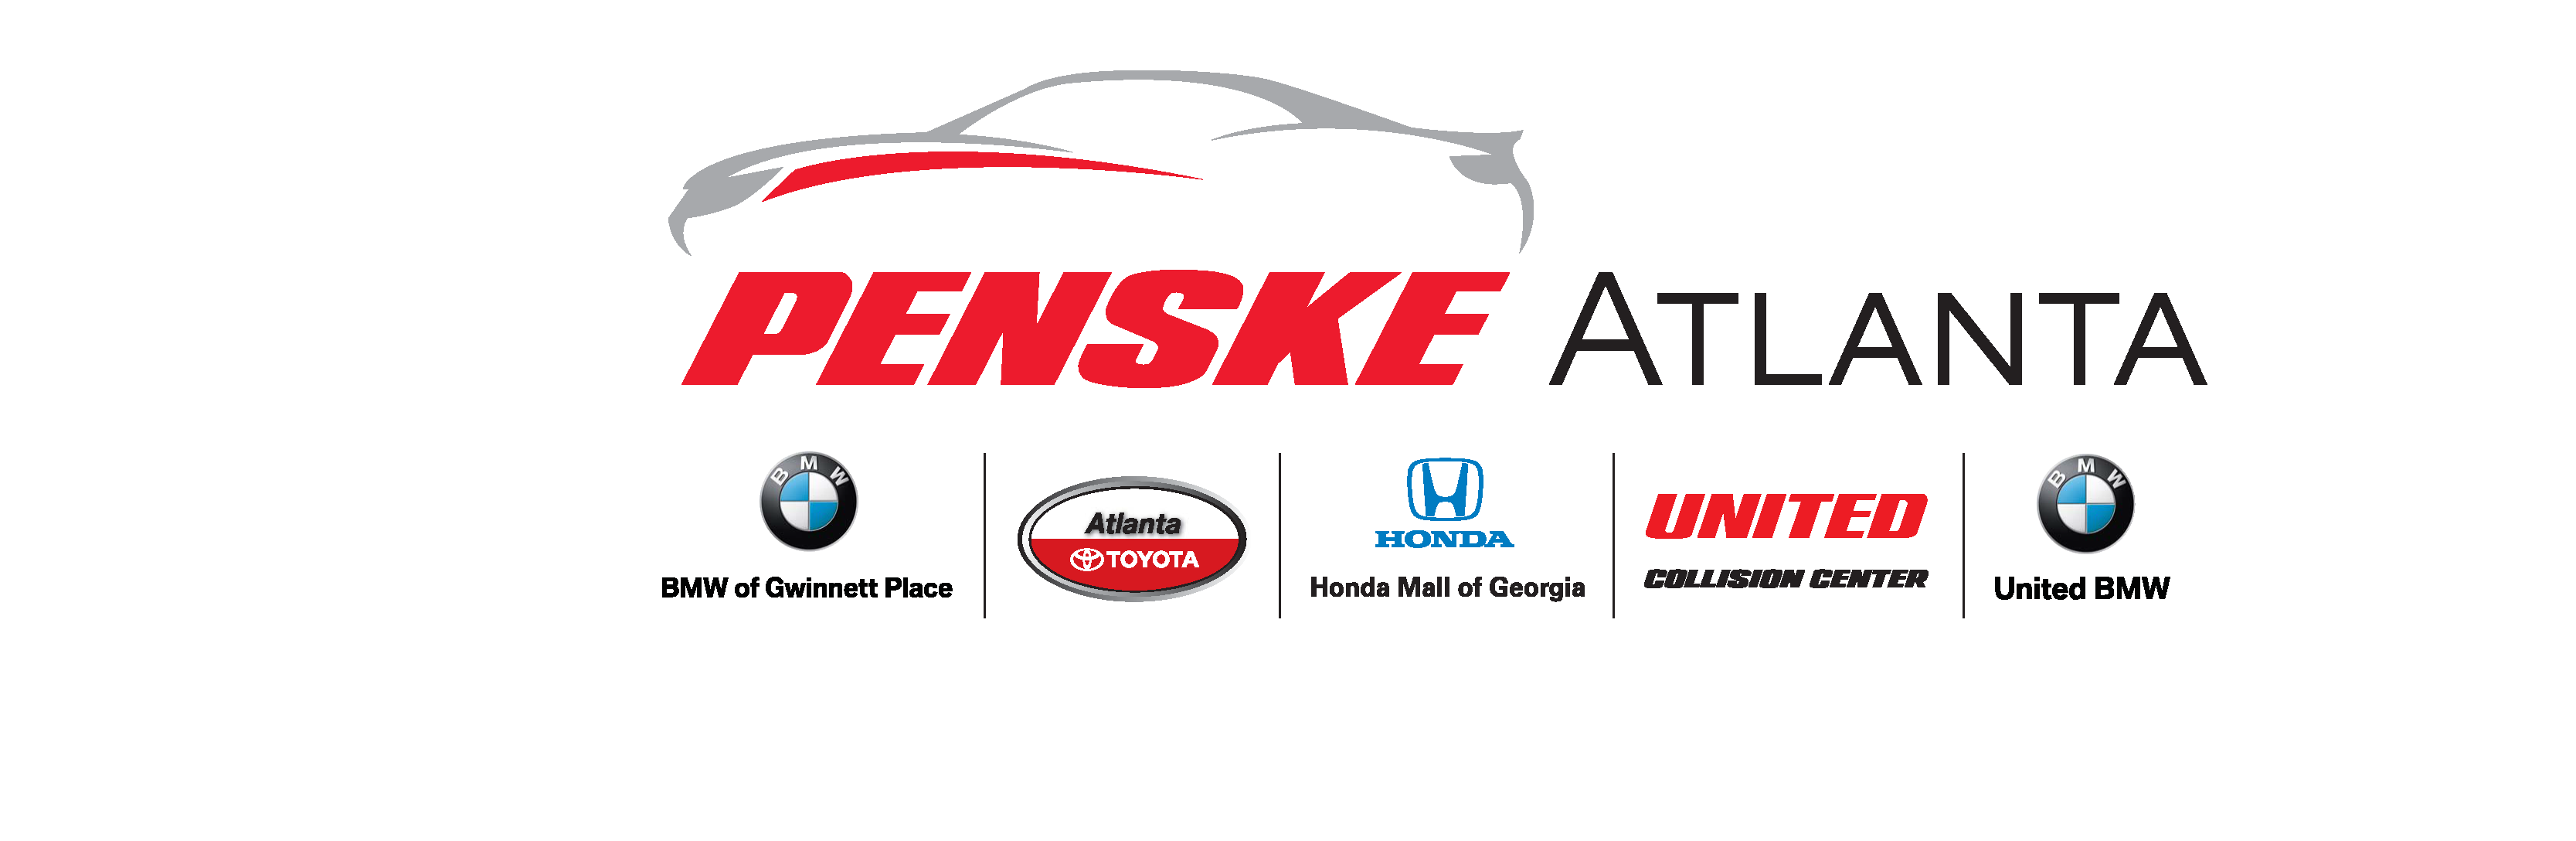 Penske Automotive Group logo